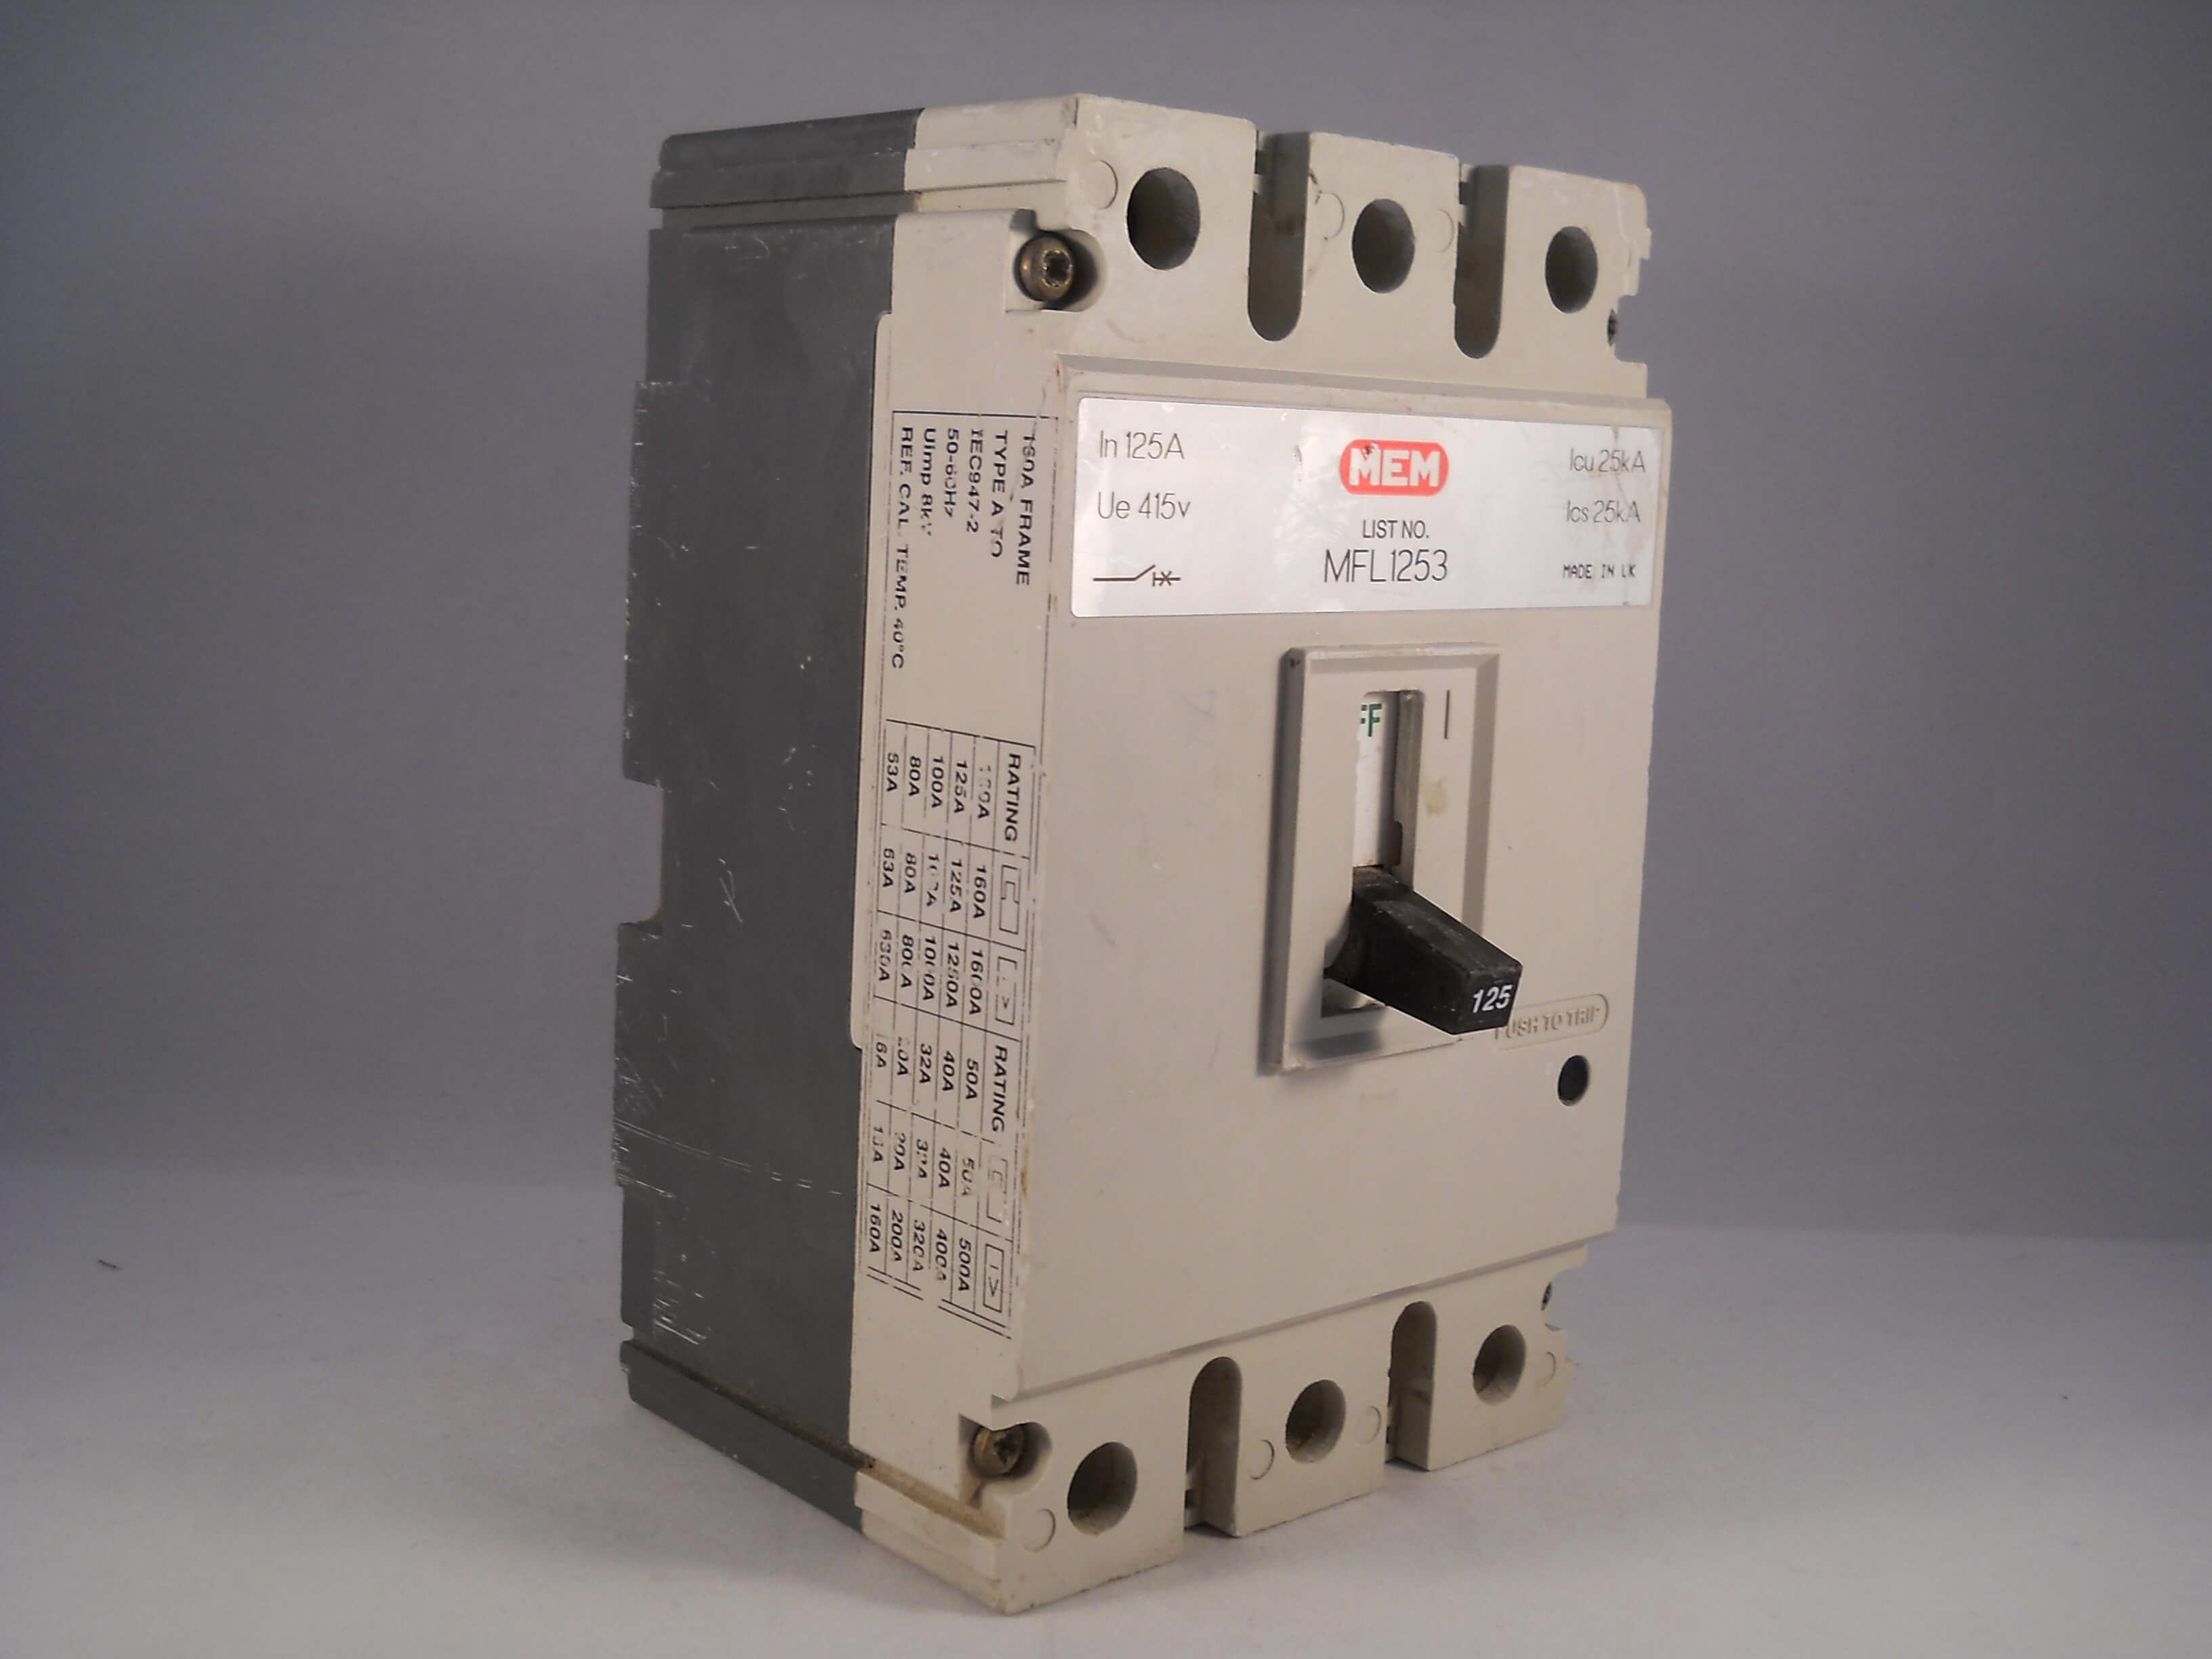 Speed Resistor Replacement Likewise Fluorescent Light Ballast Wiring